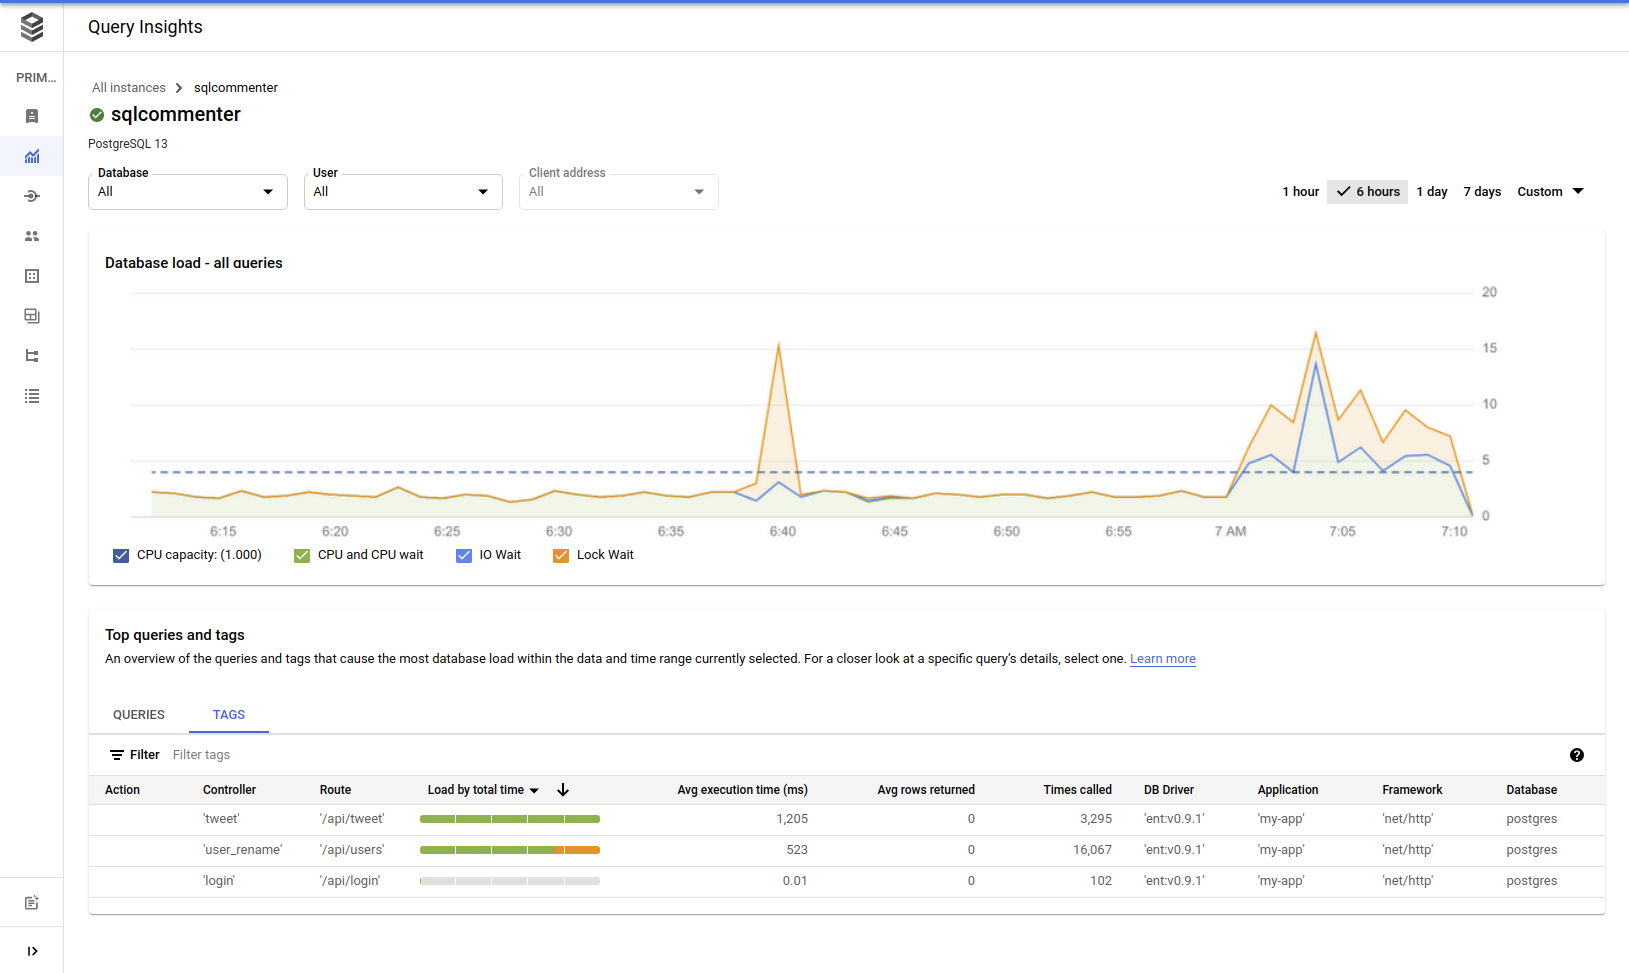 Cloud SQL insights